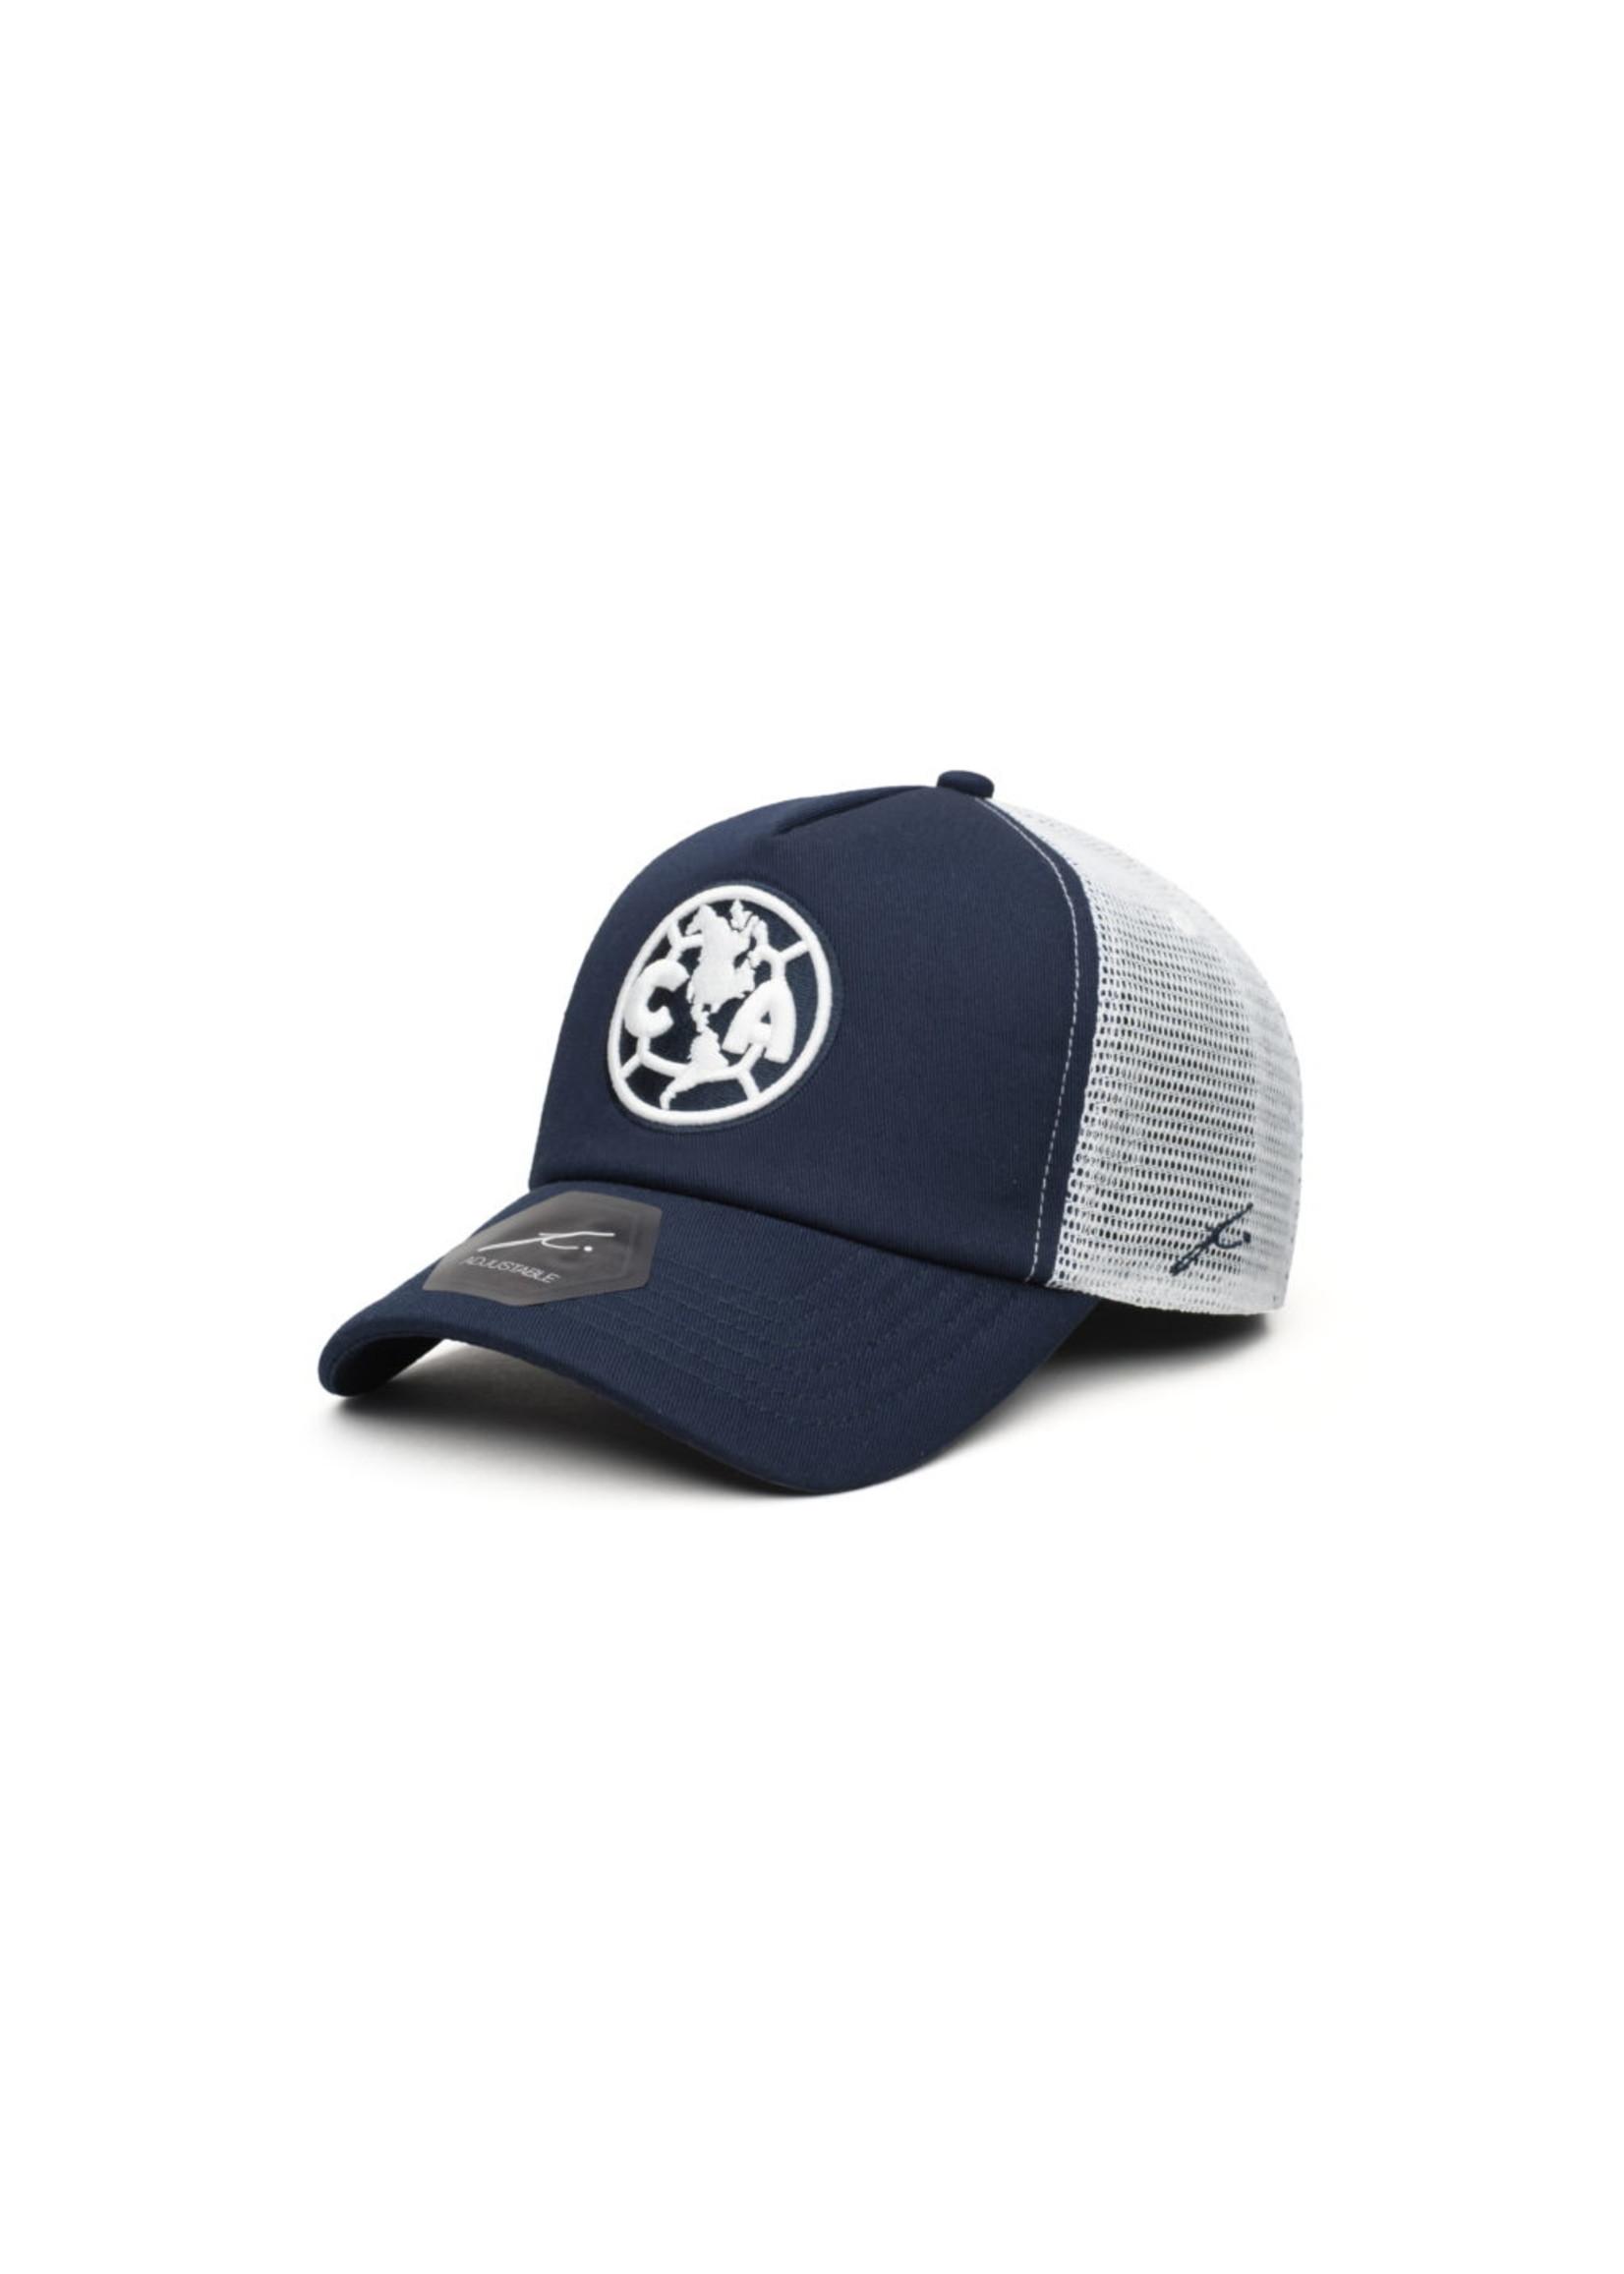 Club America Mesh Based Baseball Hat